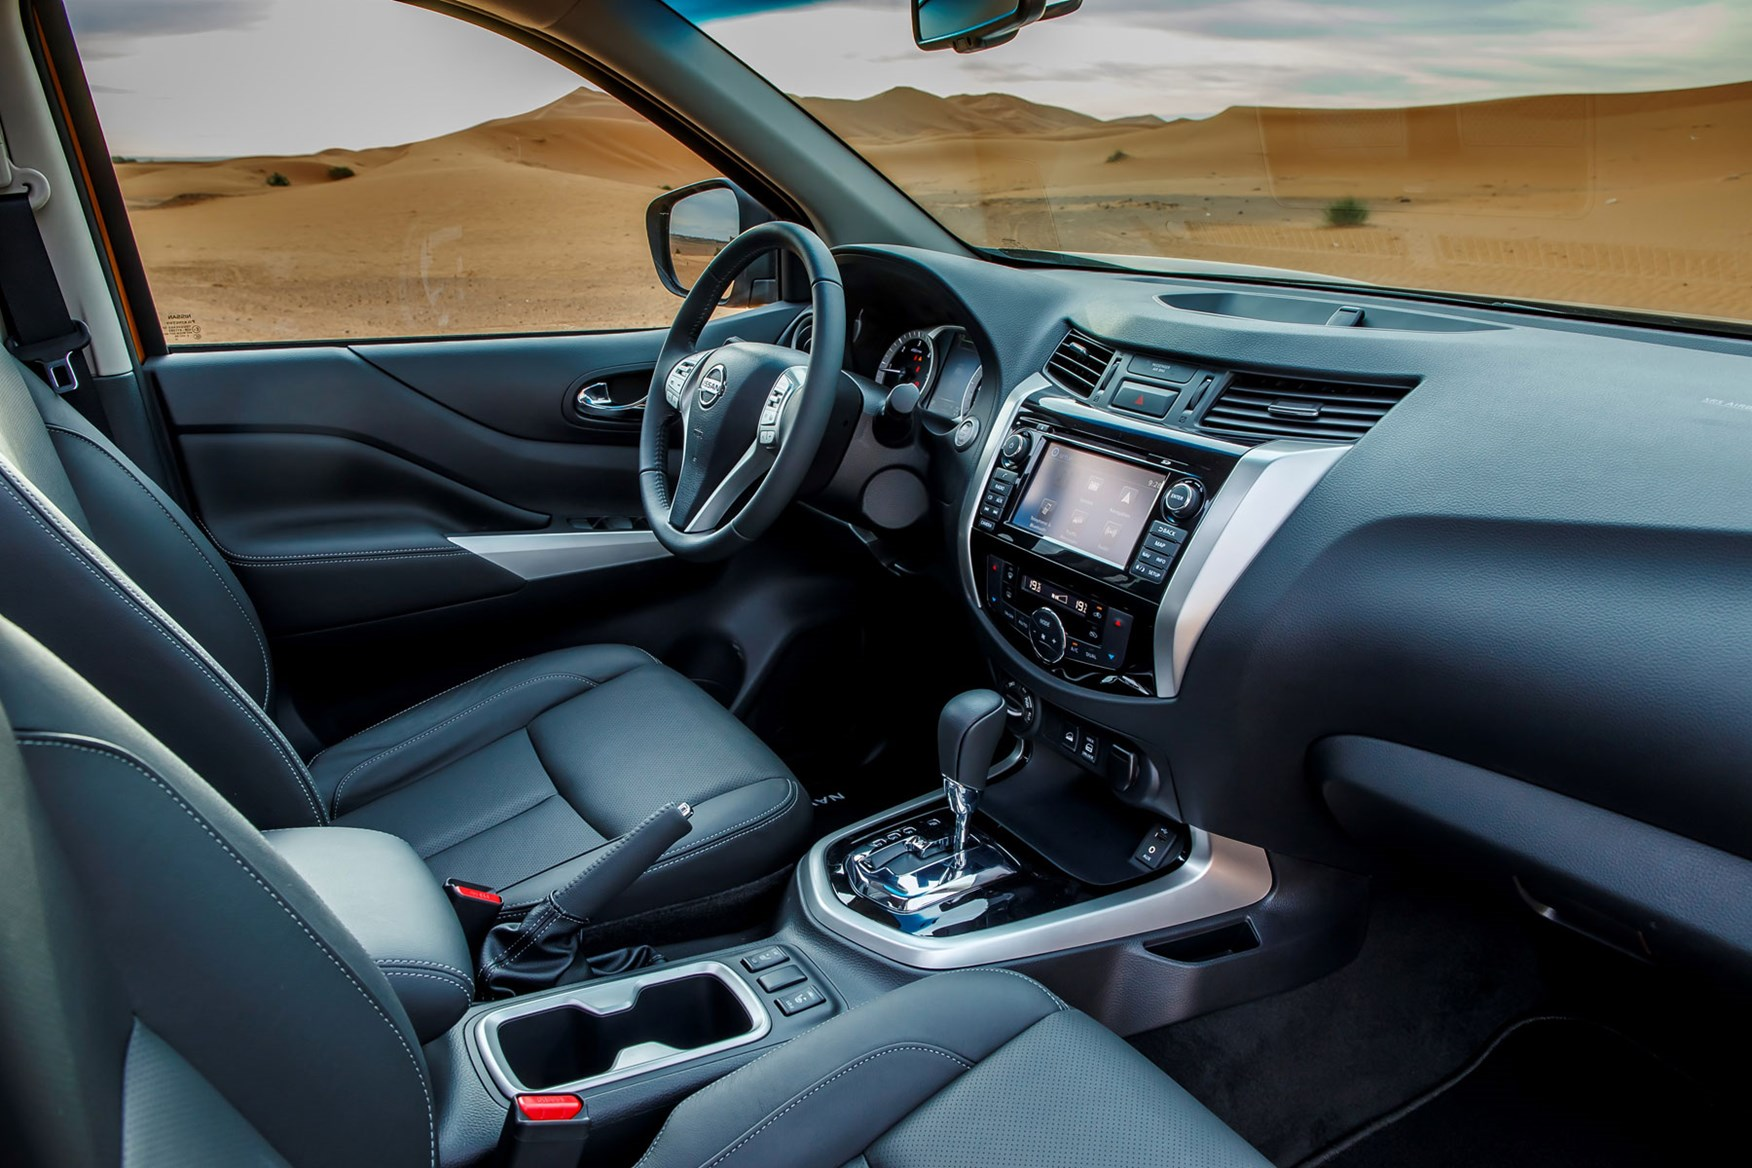 Nissan Navara Tekna review - cab interior, steering wheel, dashboard